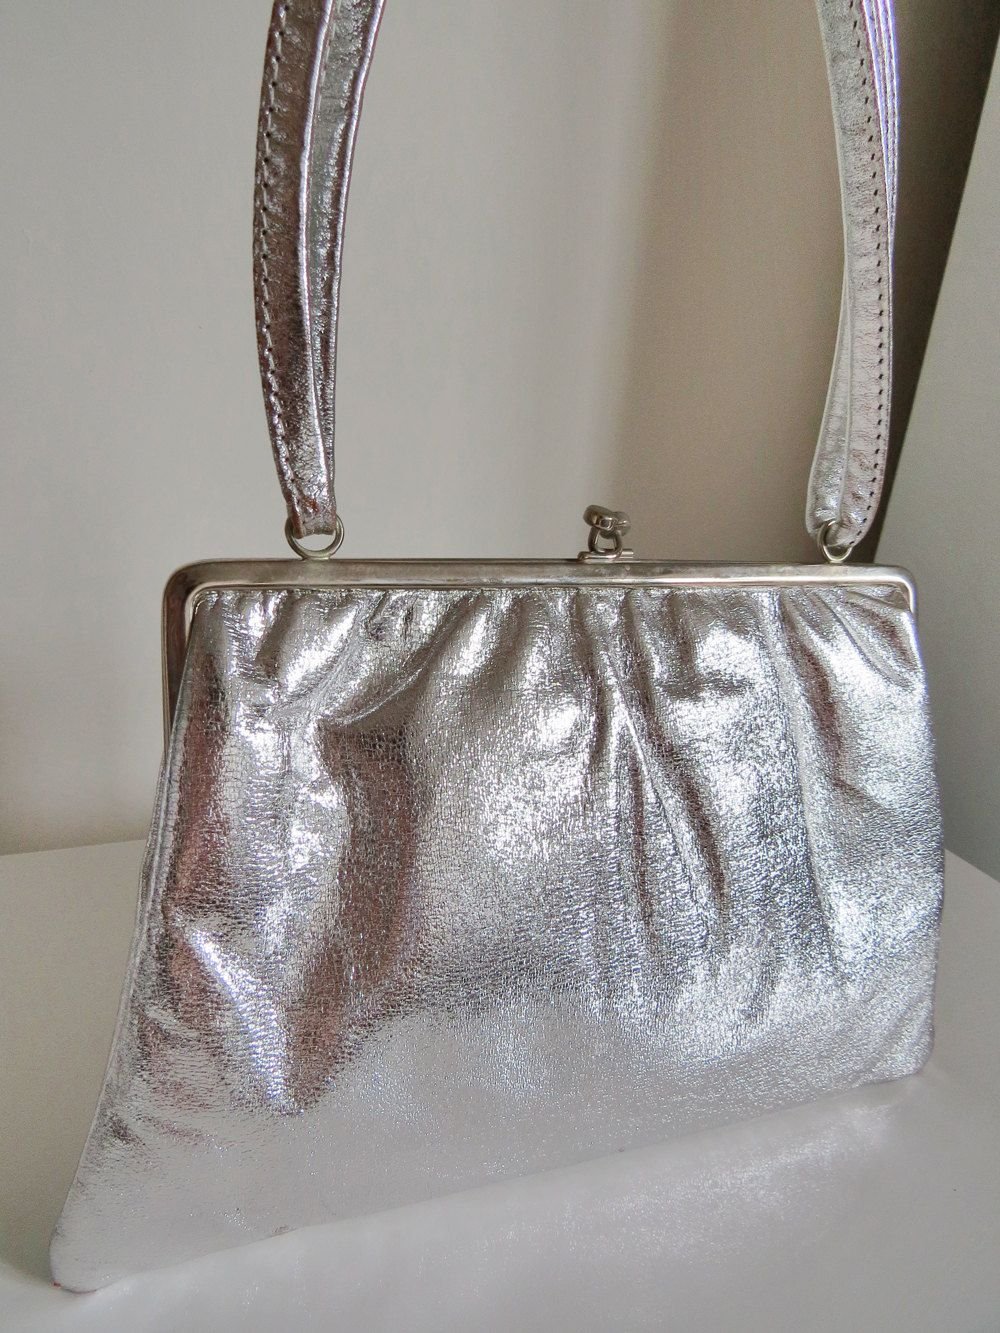 Vintage Silver Leather Handbag By Jane Shilton Made In England Vintagebysuzanne On Etsy